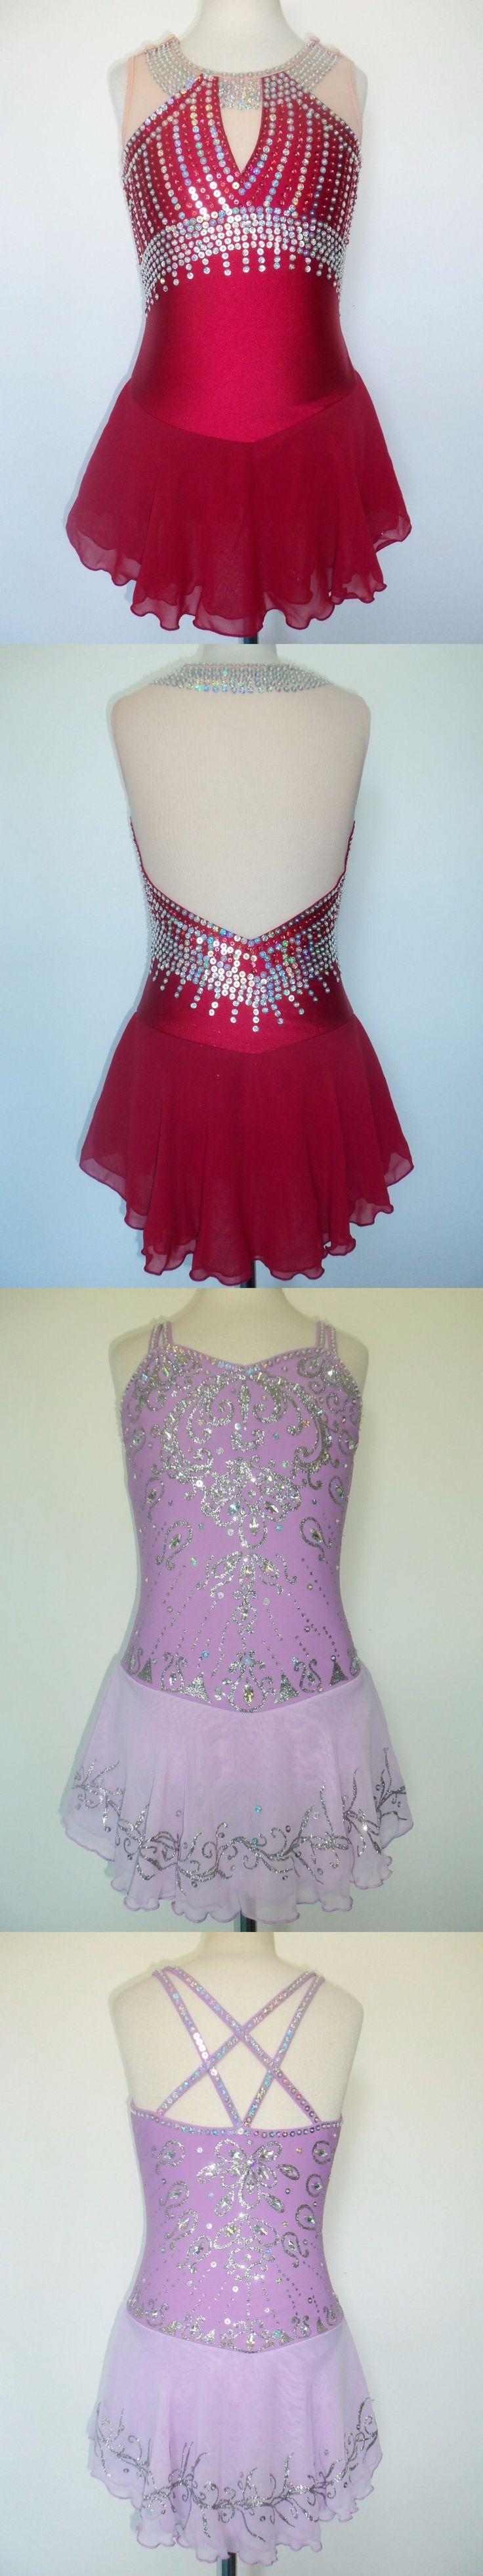 Skating Dresses-Girls 21226: Custom Made Figure New Ice Skating Baton Twirling Dress -> BUY IT NOW ONLY: $170 on eBay!